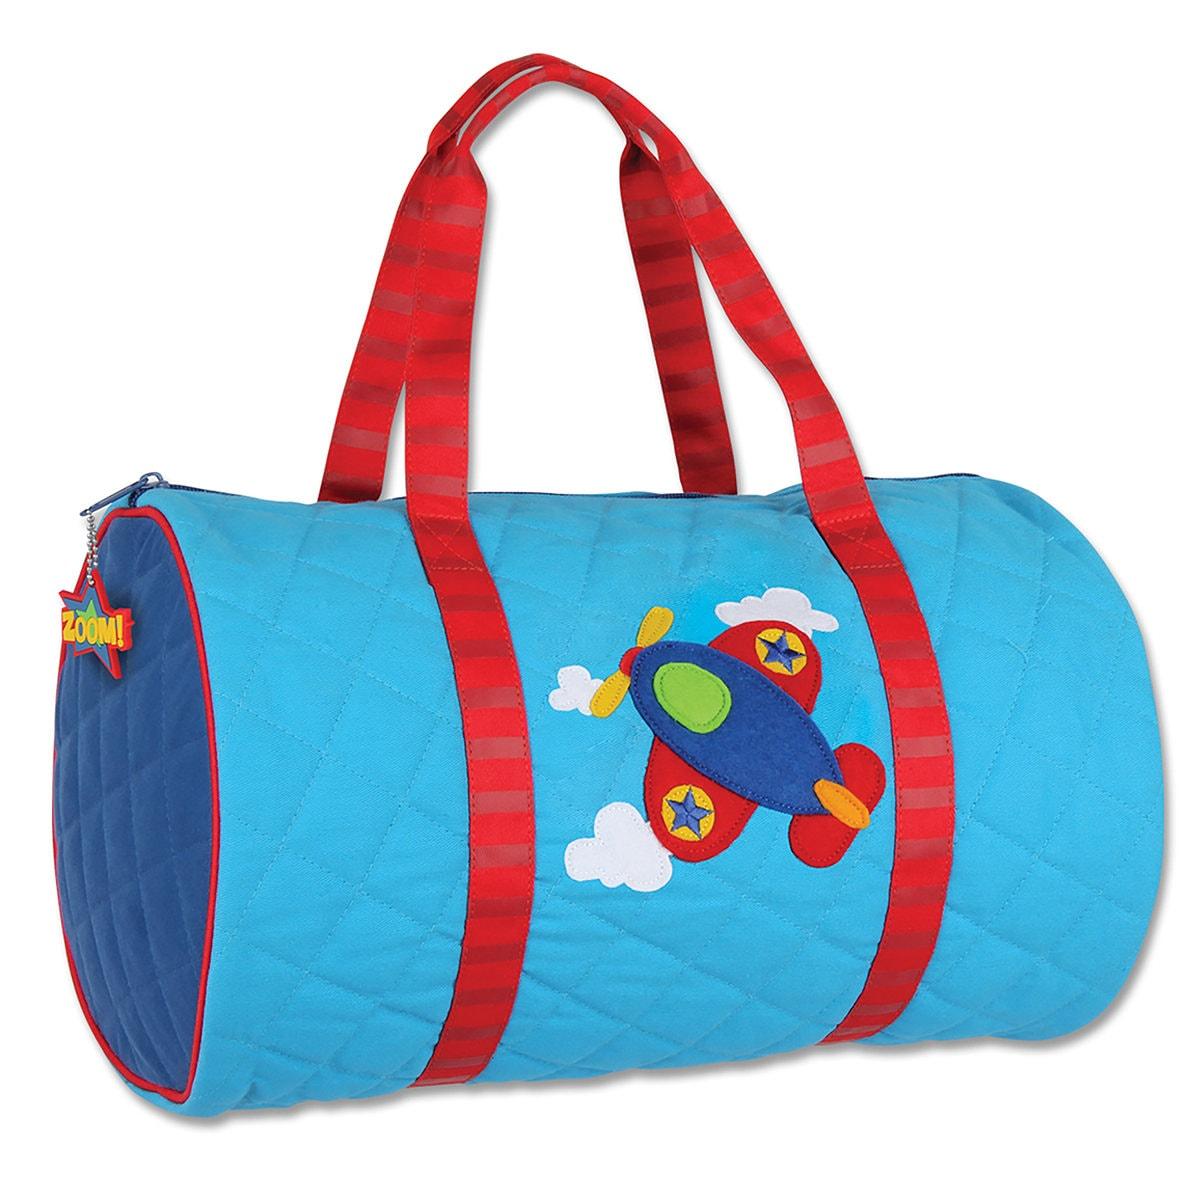 f2ed786530 Airplane Quilted Duffle Bag Stephen Joseph Children s Duffle Bag Overnight  Pirate Dance Gymnastics Swim Cute Pirate Applique Bag Boy Girl